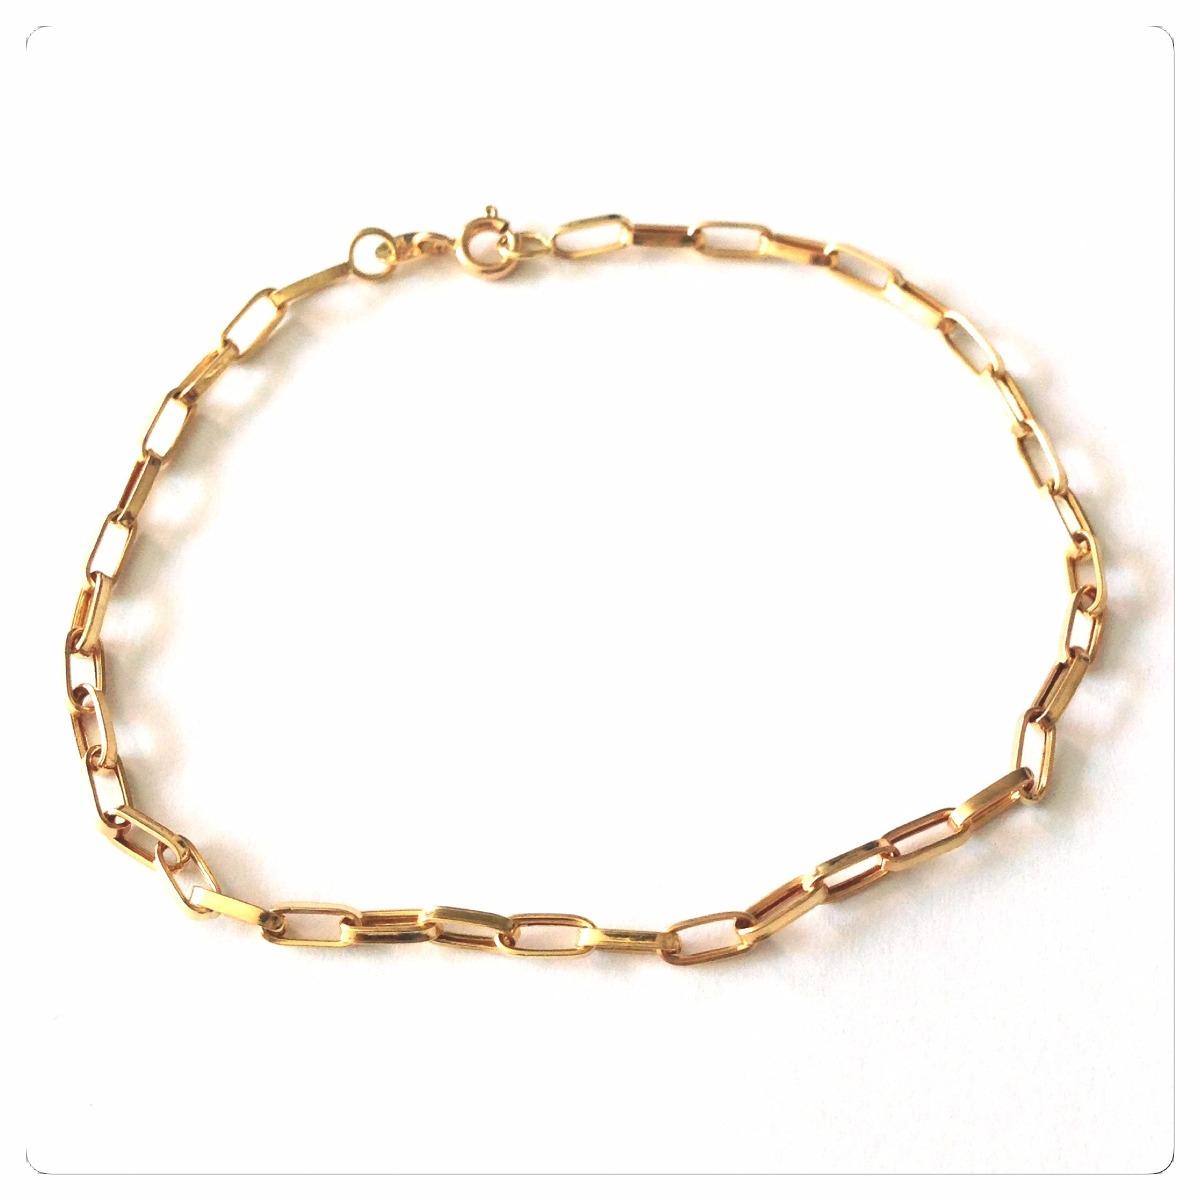 454c107d5a005 pulseira masculina de 19 cm ouro 18k elos de 3mmx6mm. Carregando zoom.